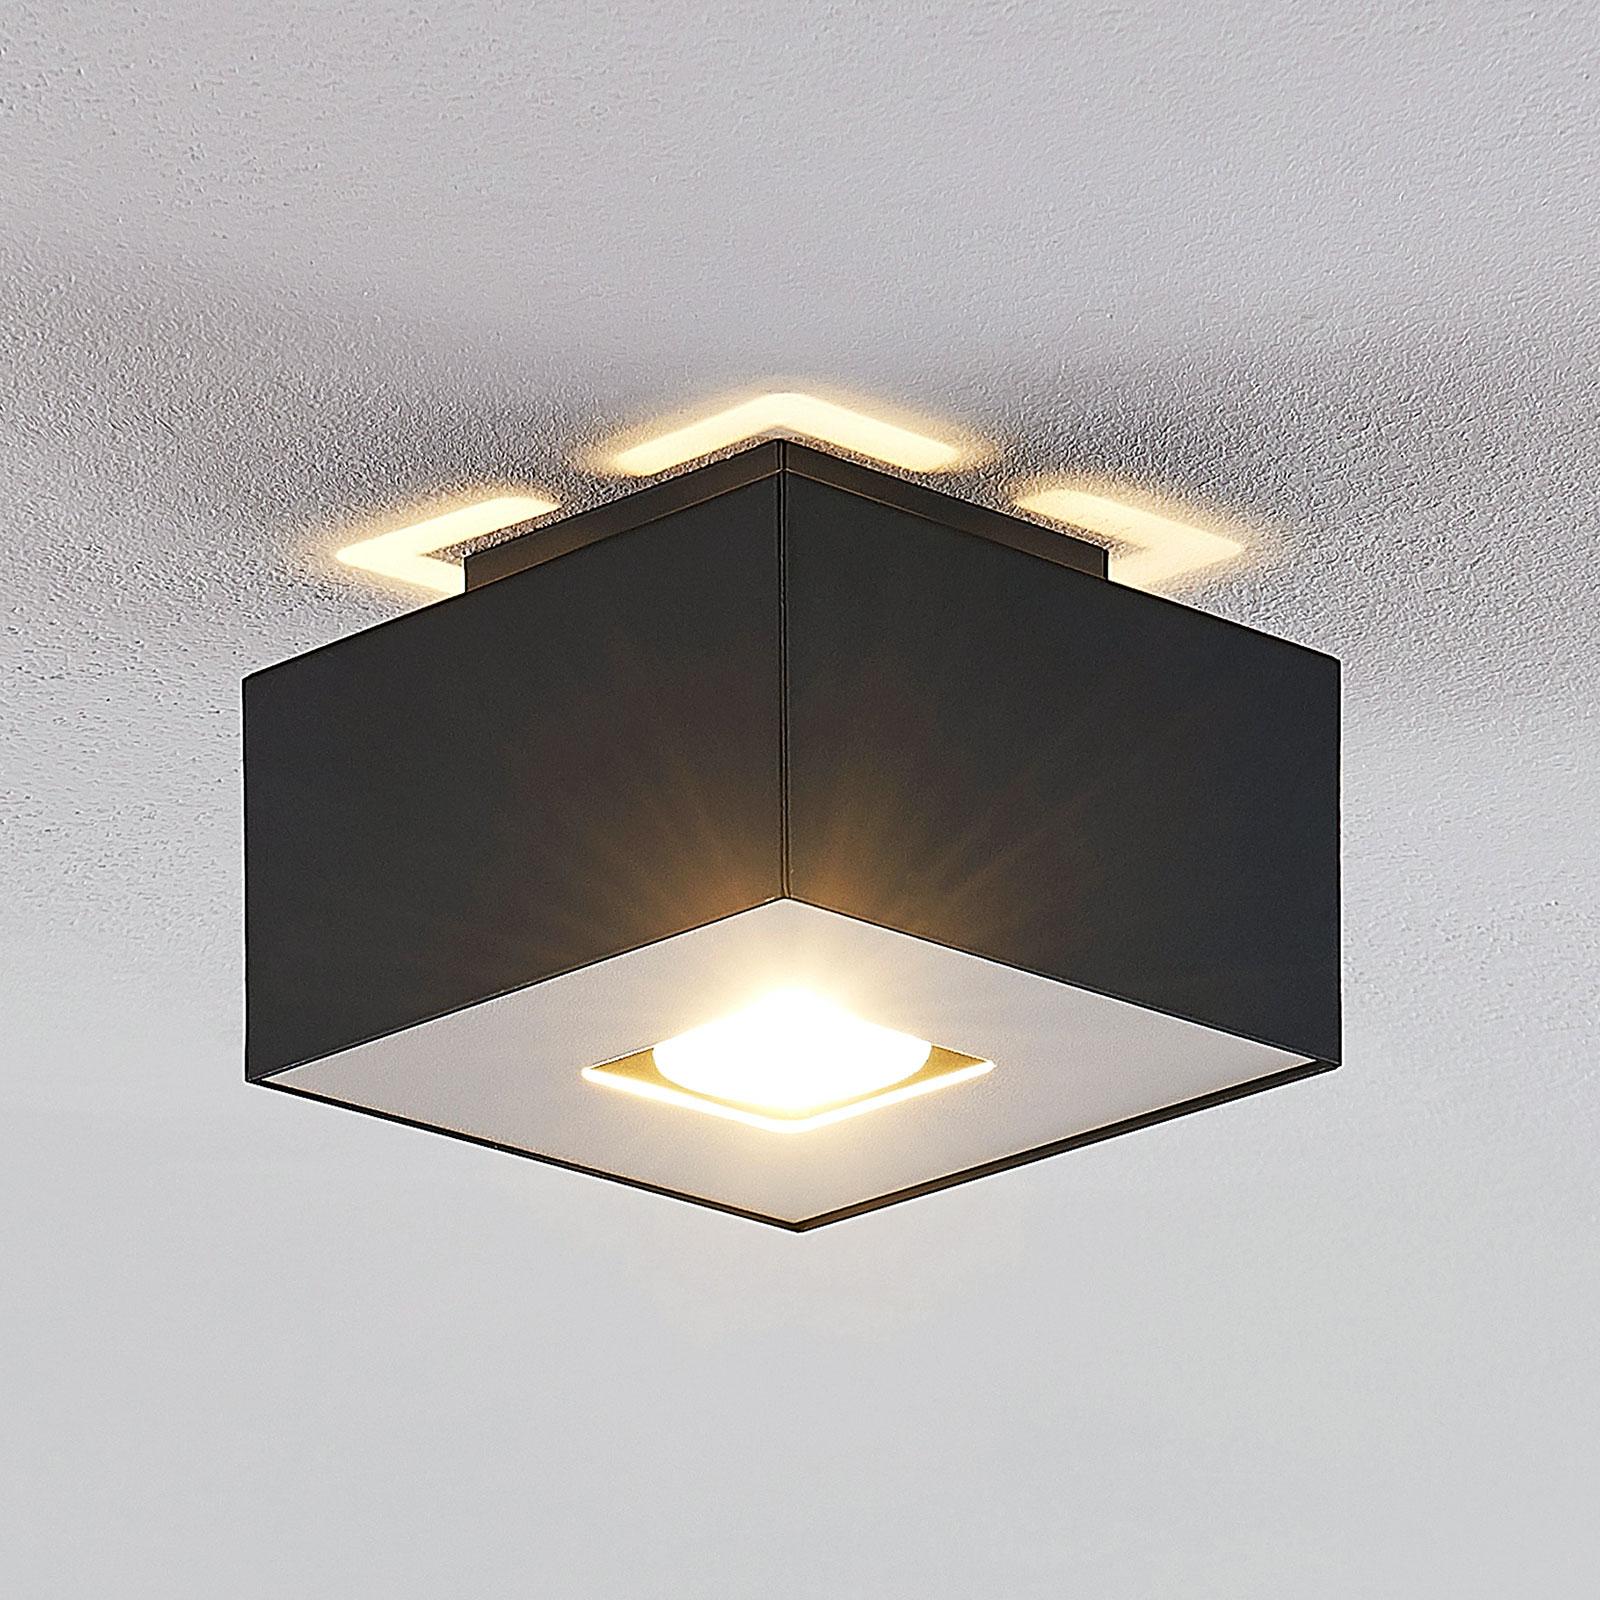 Lindby Kasi taklampe, en lyskilde, 14 x 14 cm